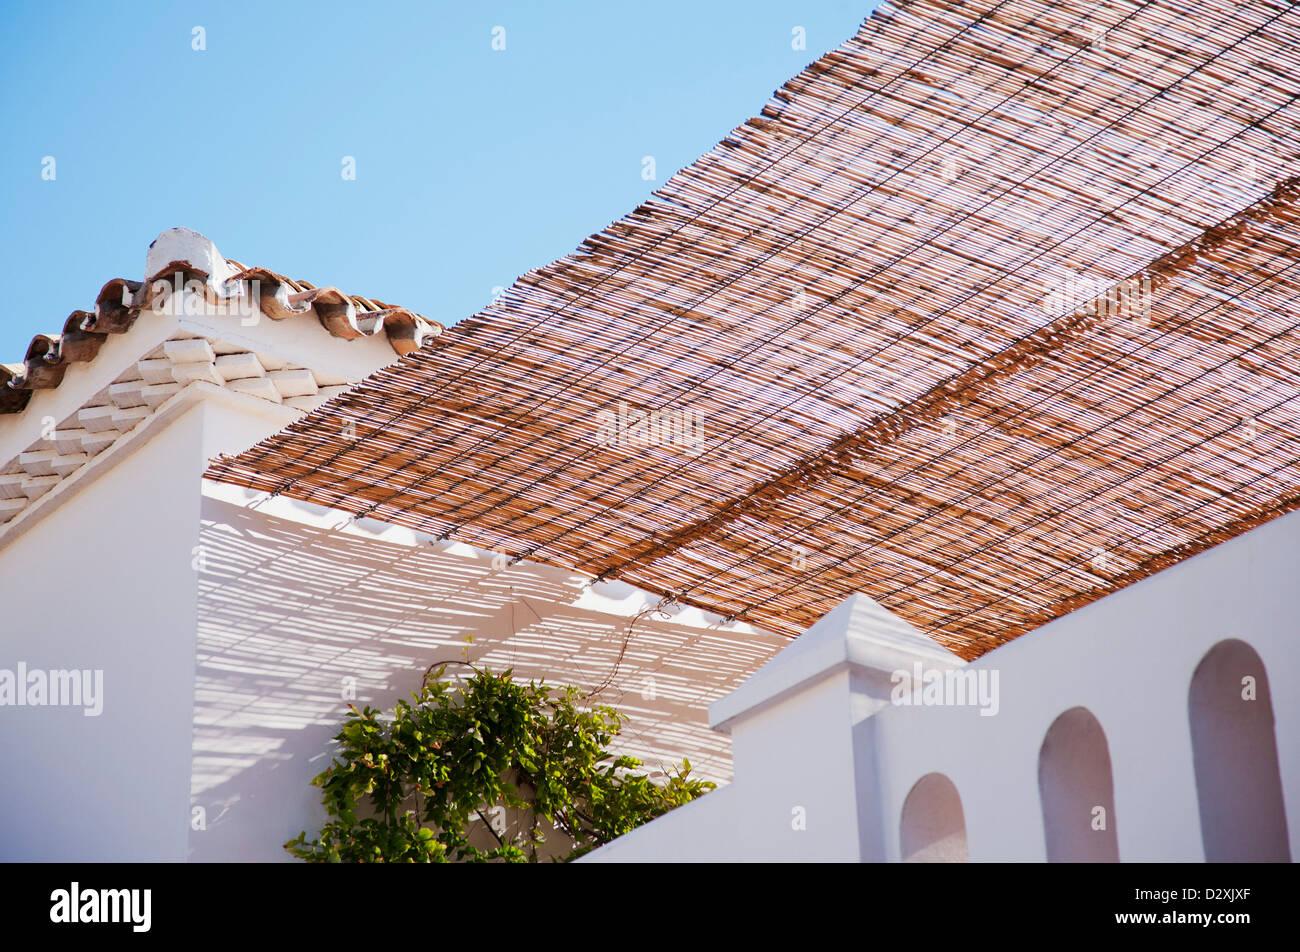 Awning over villa balcony - Stock Image